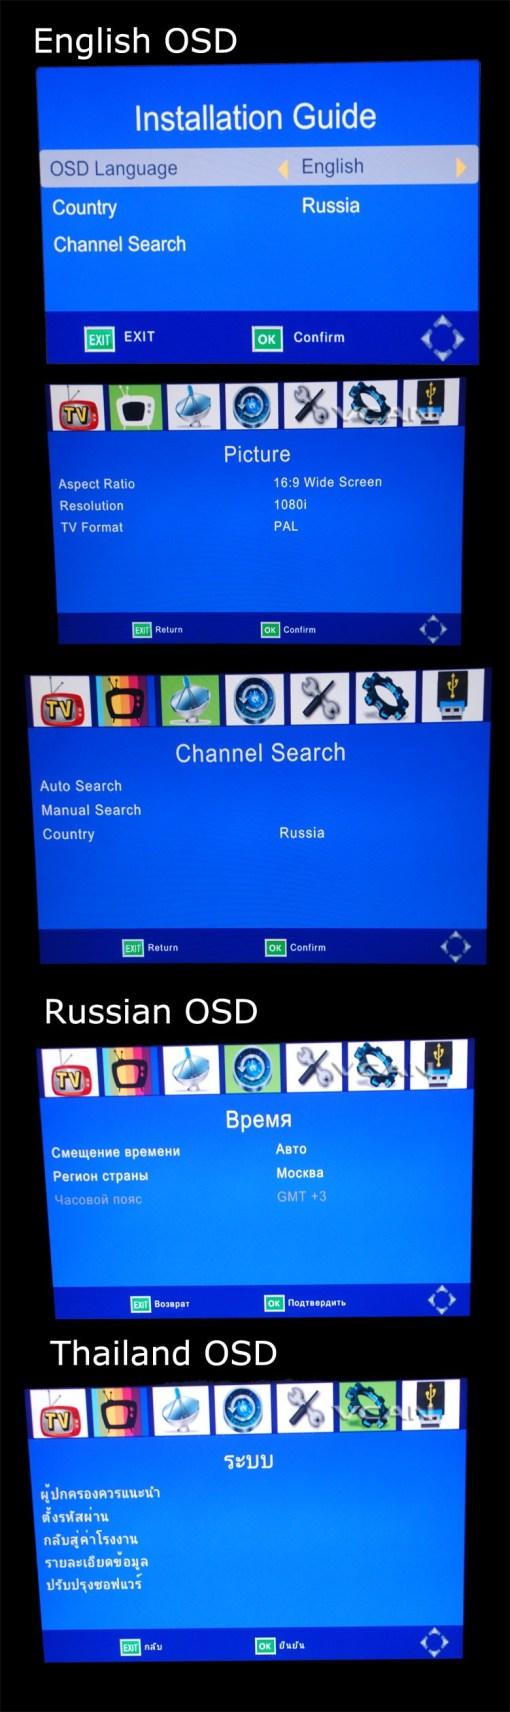 2X2 Two tuner antenna car DVB-T2 Diversity High Speed Russia Thailand 3